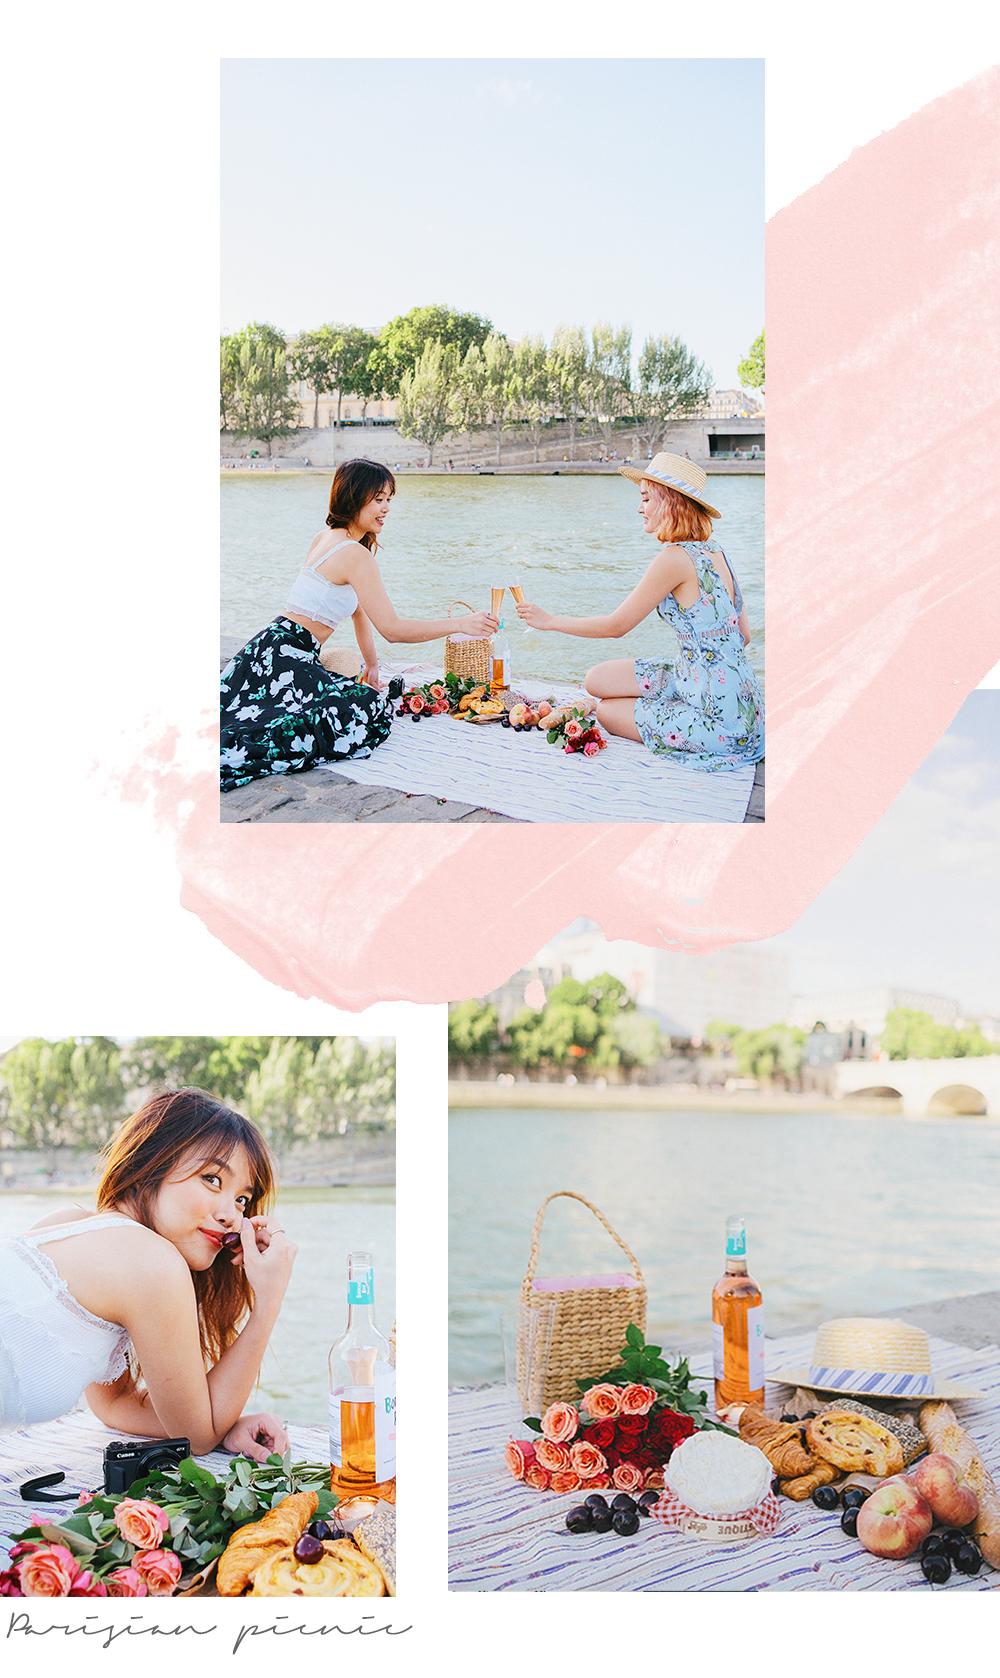 Parisian summer picnic